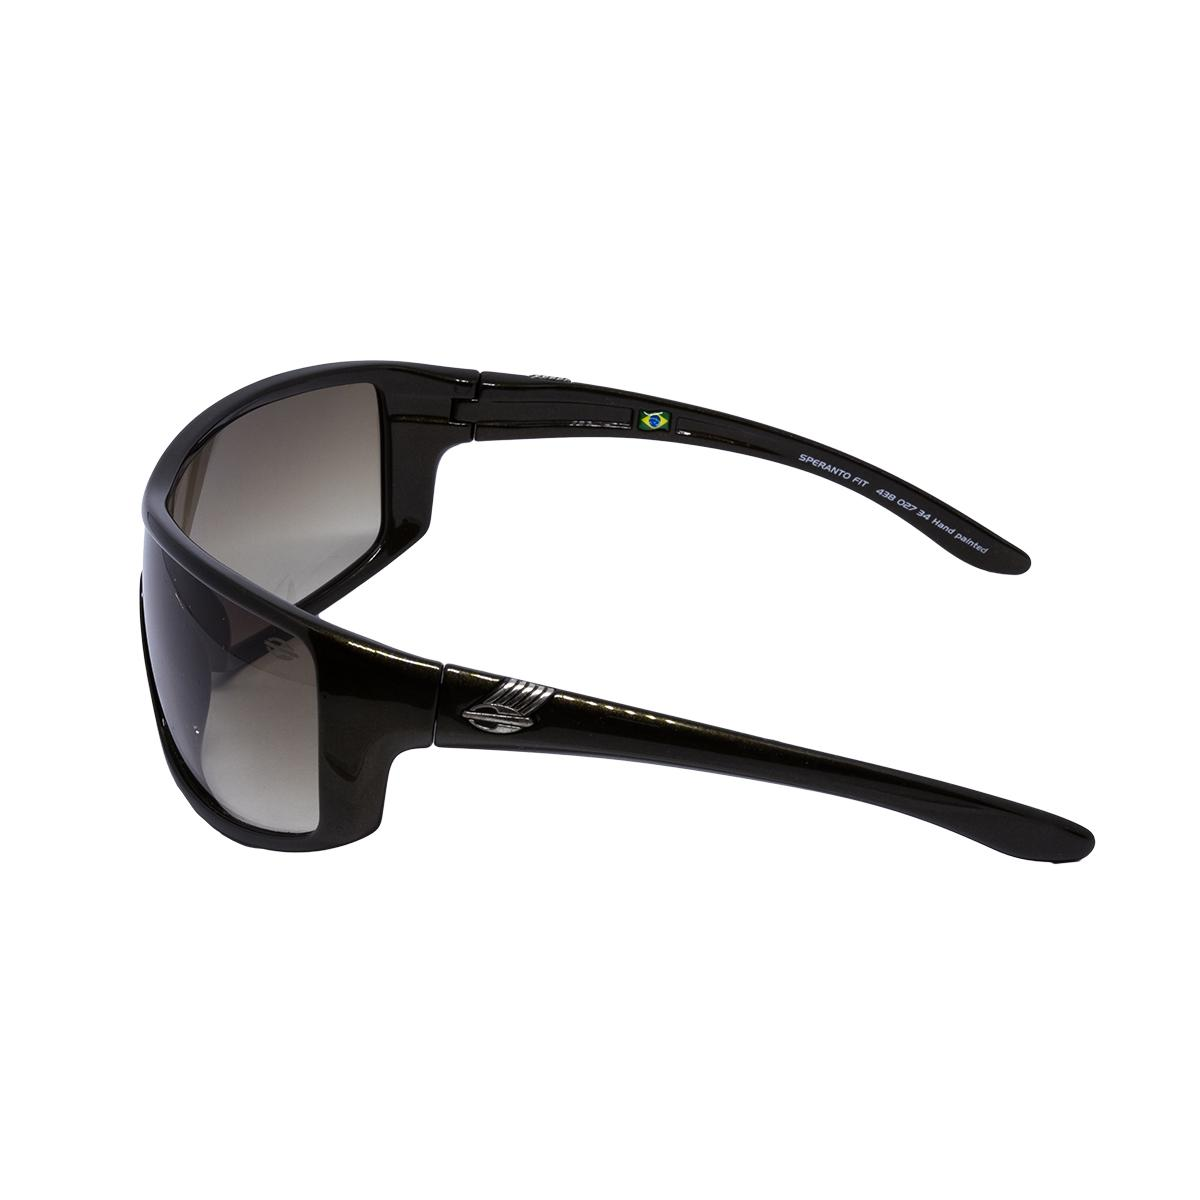 2e21fe85ed4ad Óculos de Sol Mormaii Speranto Fit 43802734 - Acetato Marrom Fumê ...